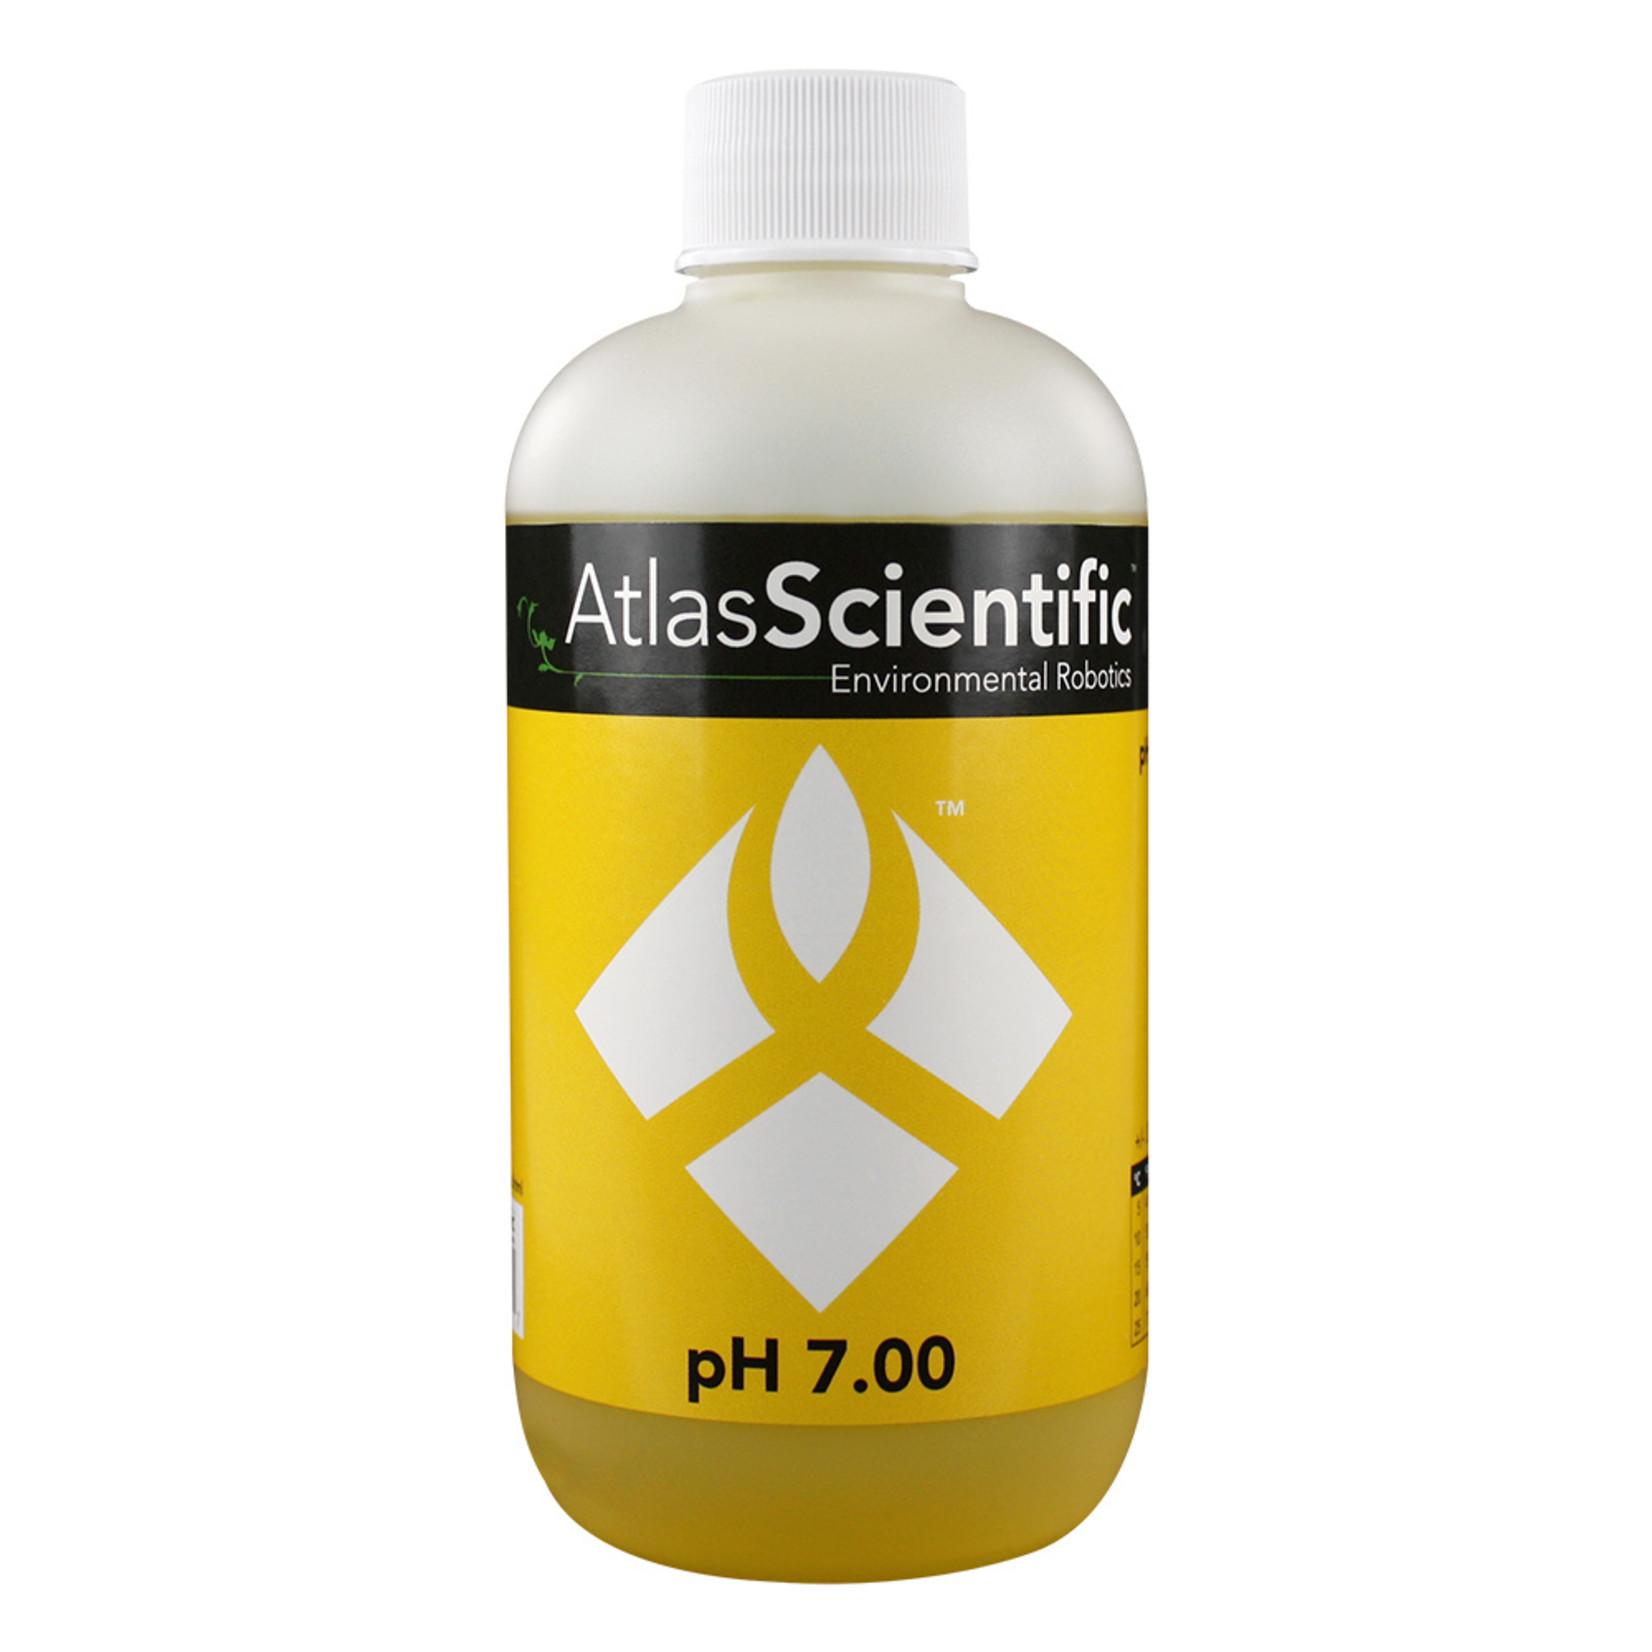 Atlas Scientific pH 7.00 Kalibratievloeistof